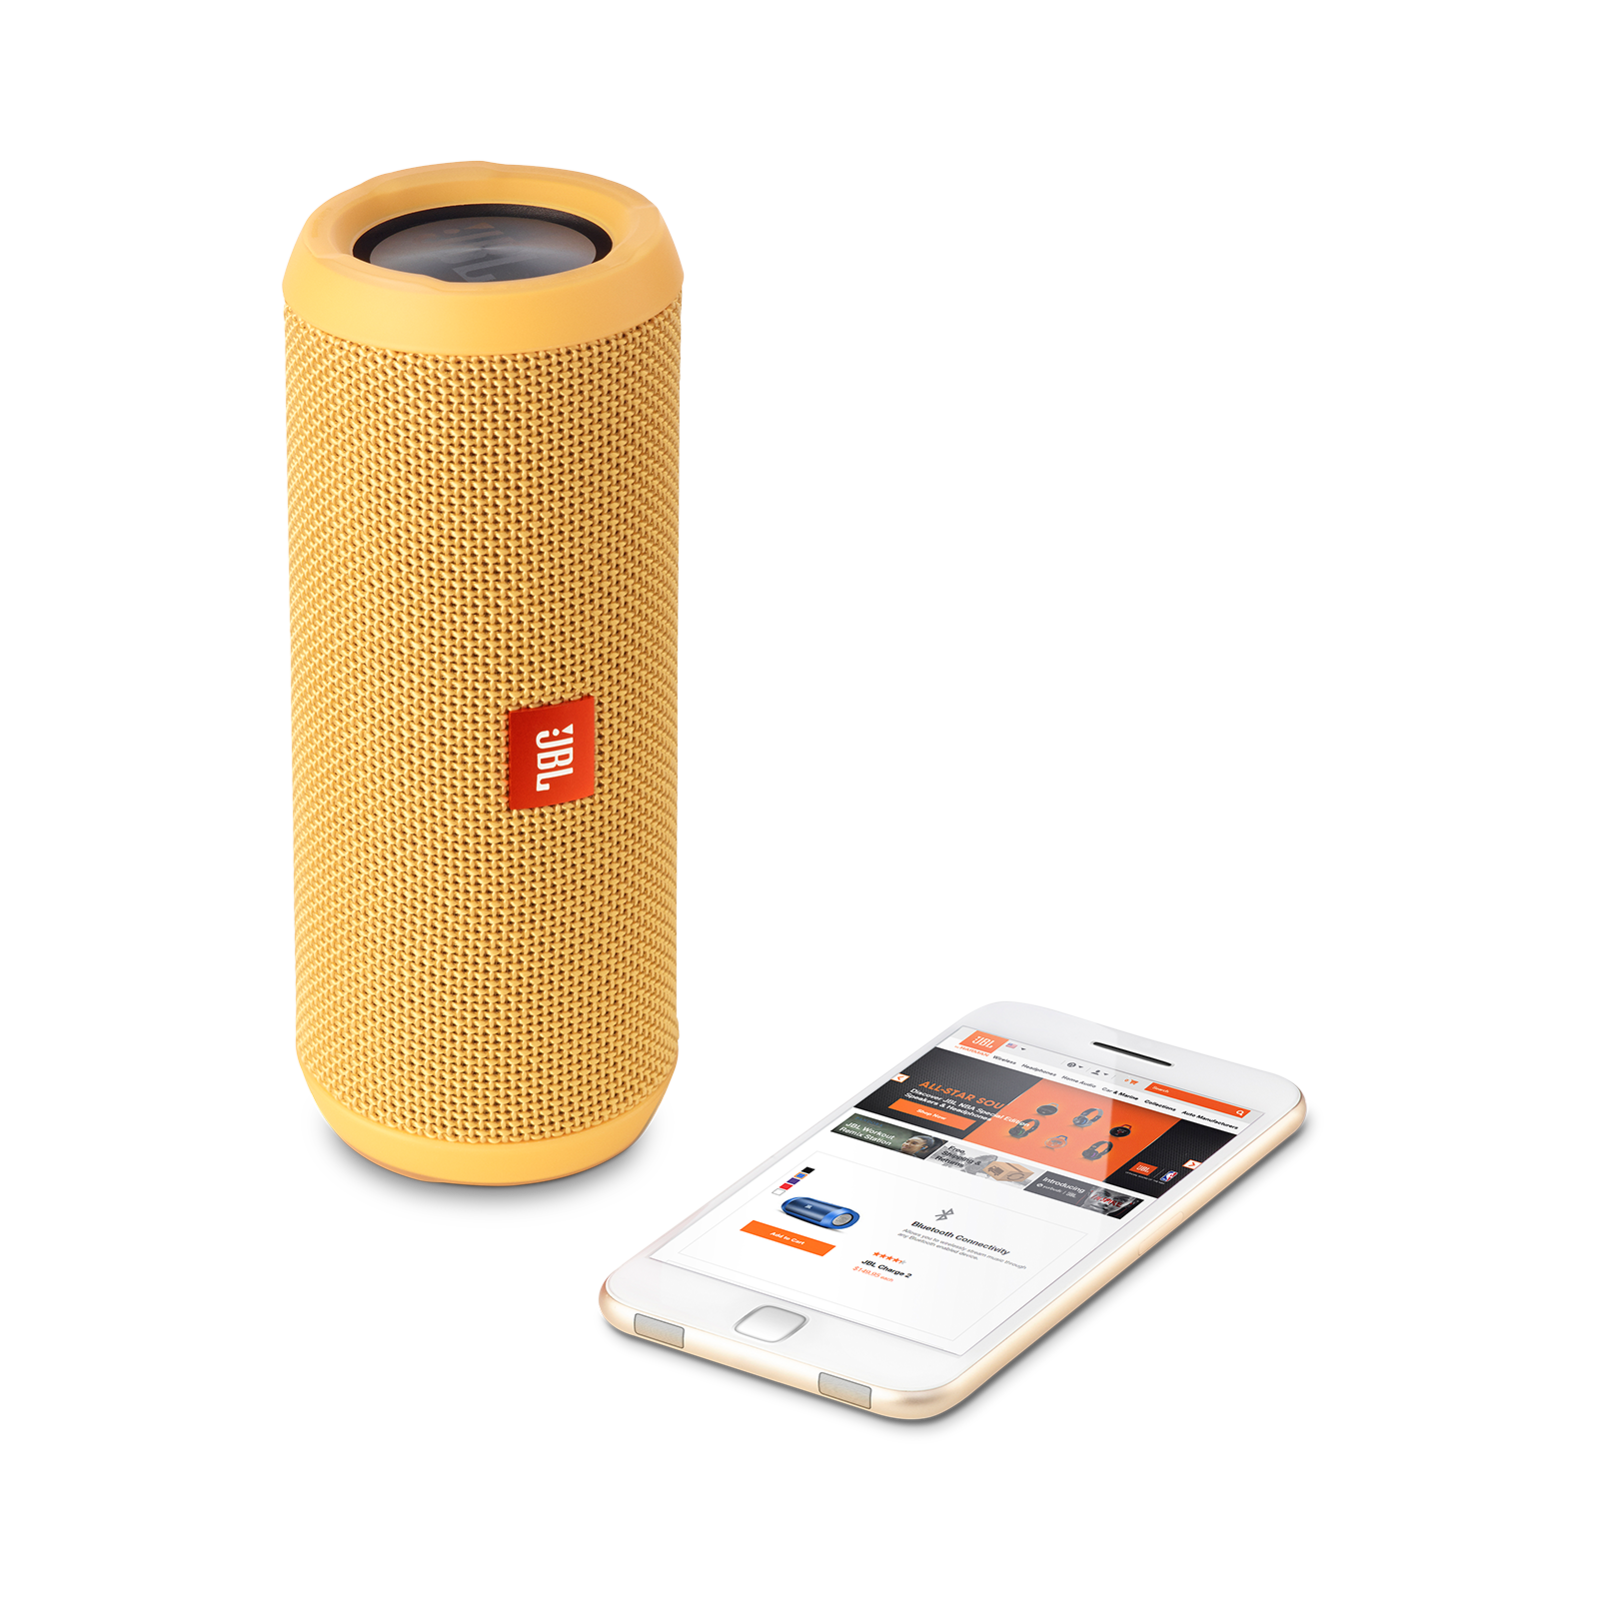 JBL Flip 3 - Yellow - Splashproof portable Bluetooth speaker with powerful sound and speakerphone technology - Detailshot 1